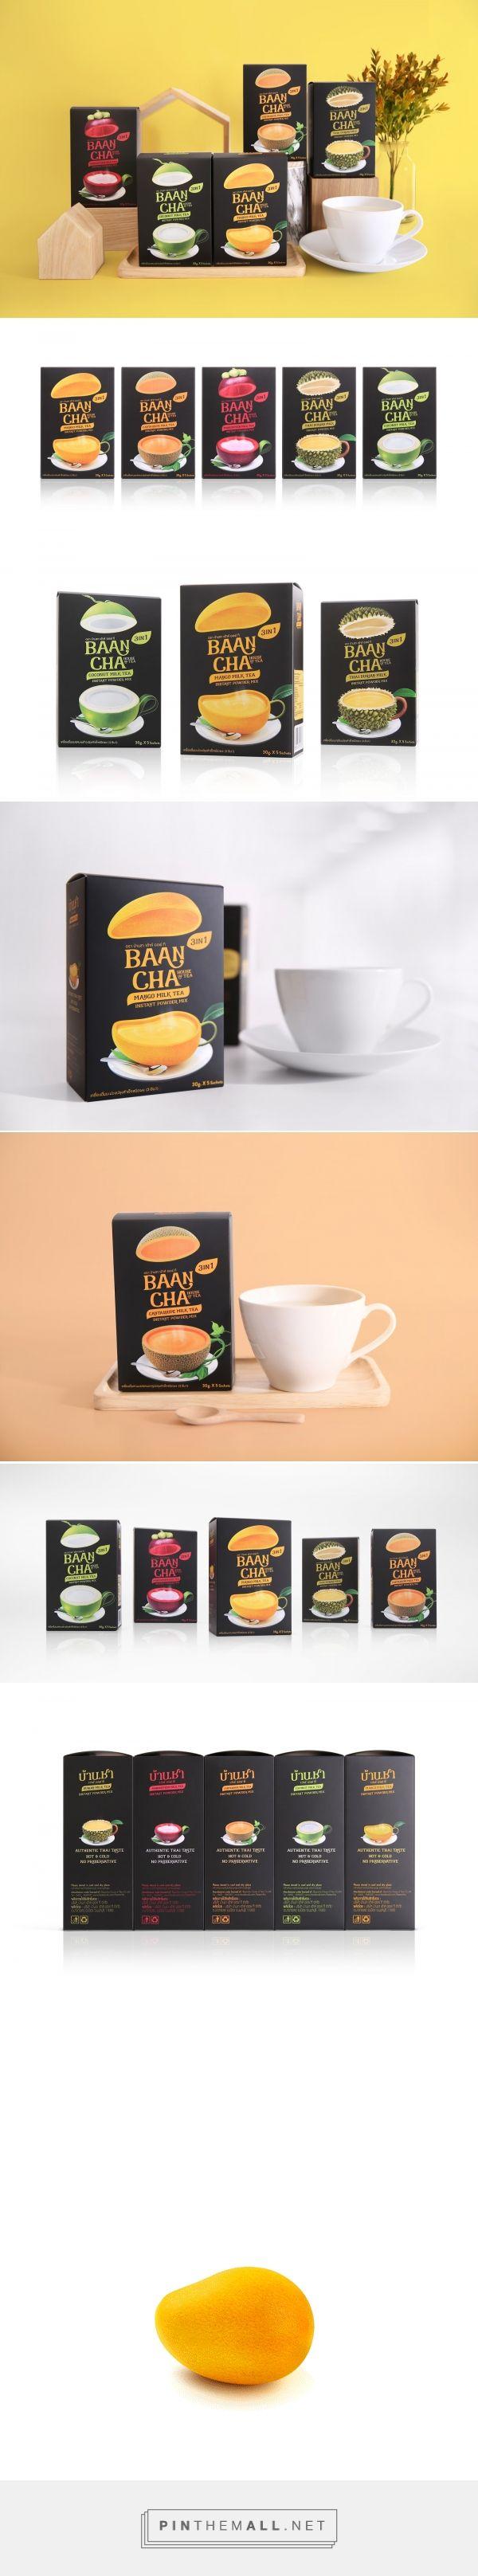 Baancha House of Tea packaging design by adHOCK Studio - http://www.packagingoftheworld.com/2016/10/baancha-house-of-tea.html